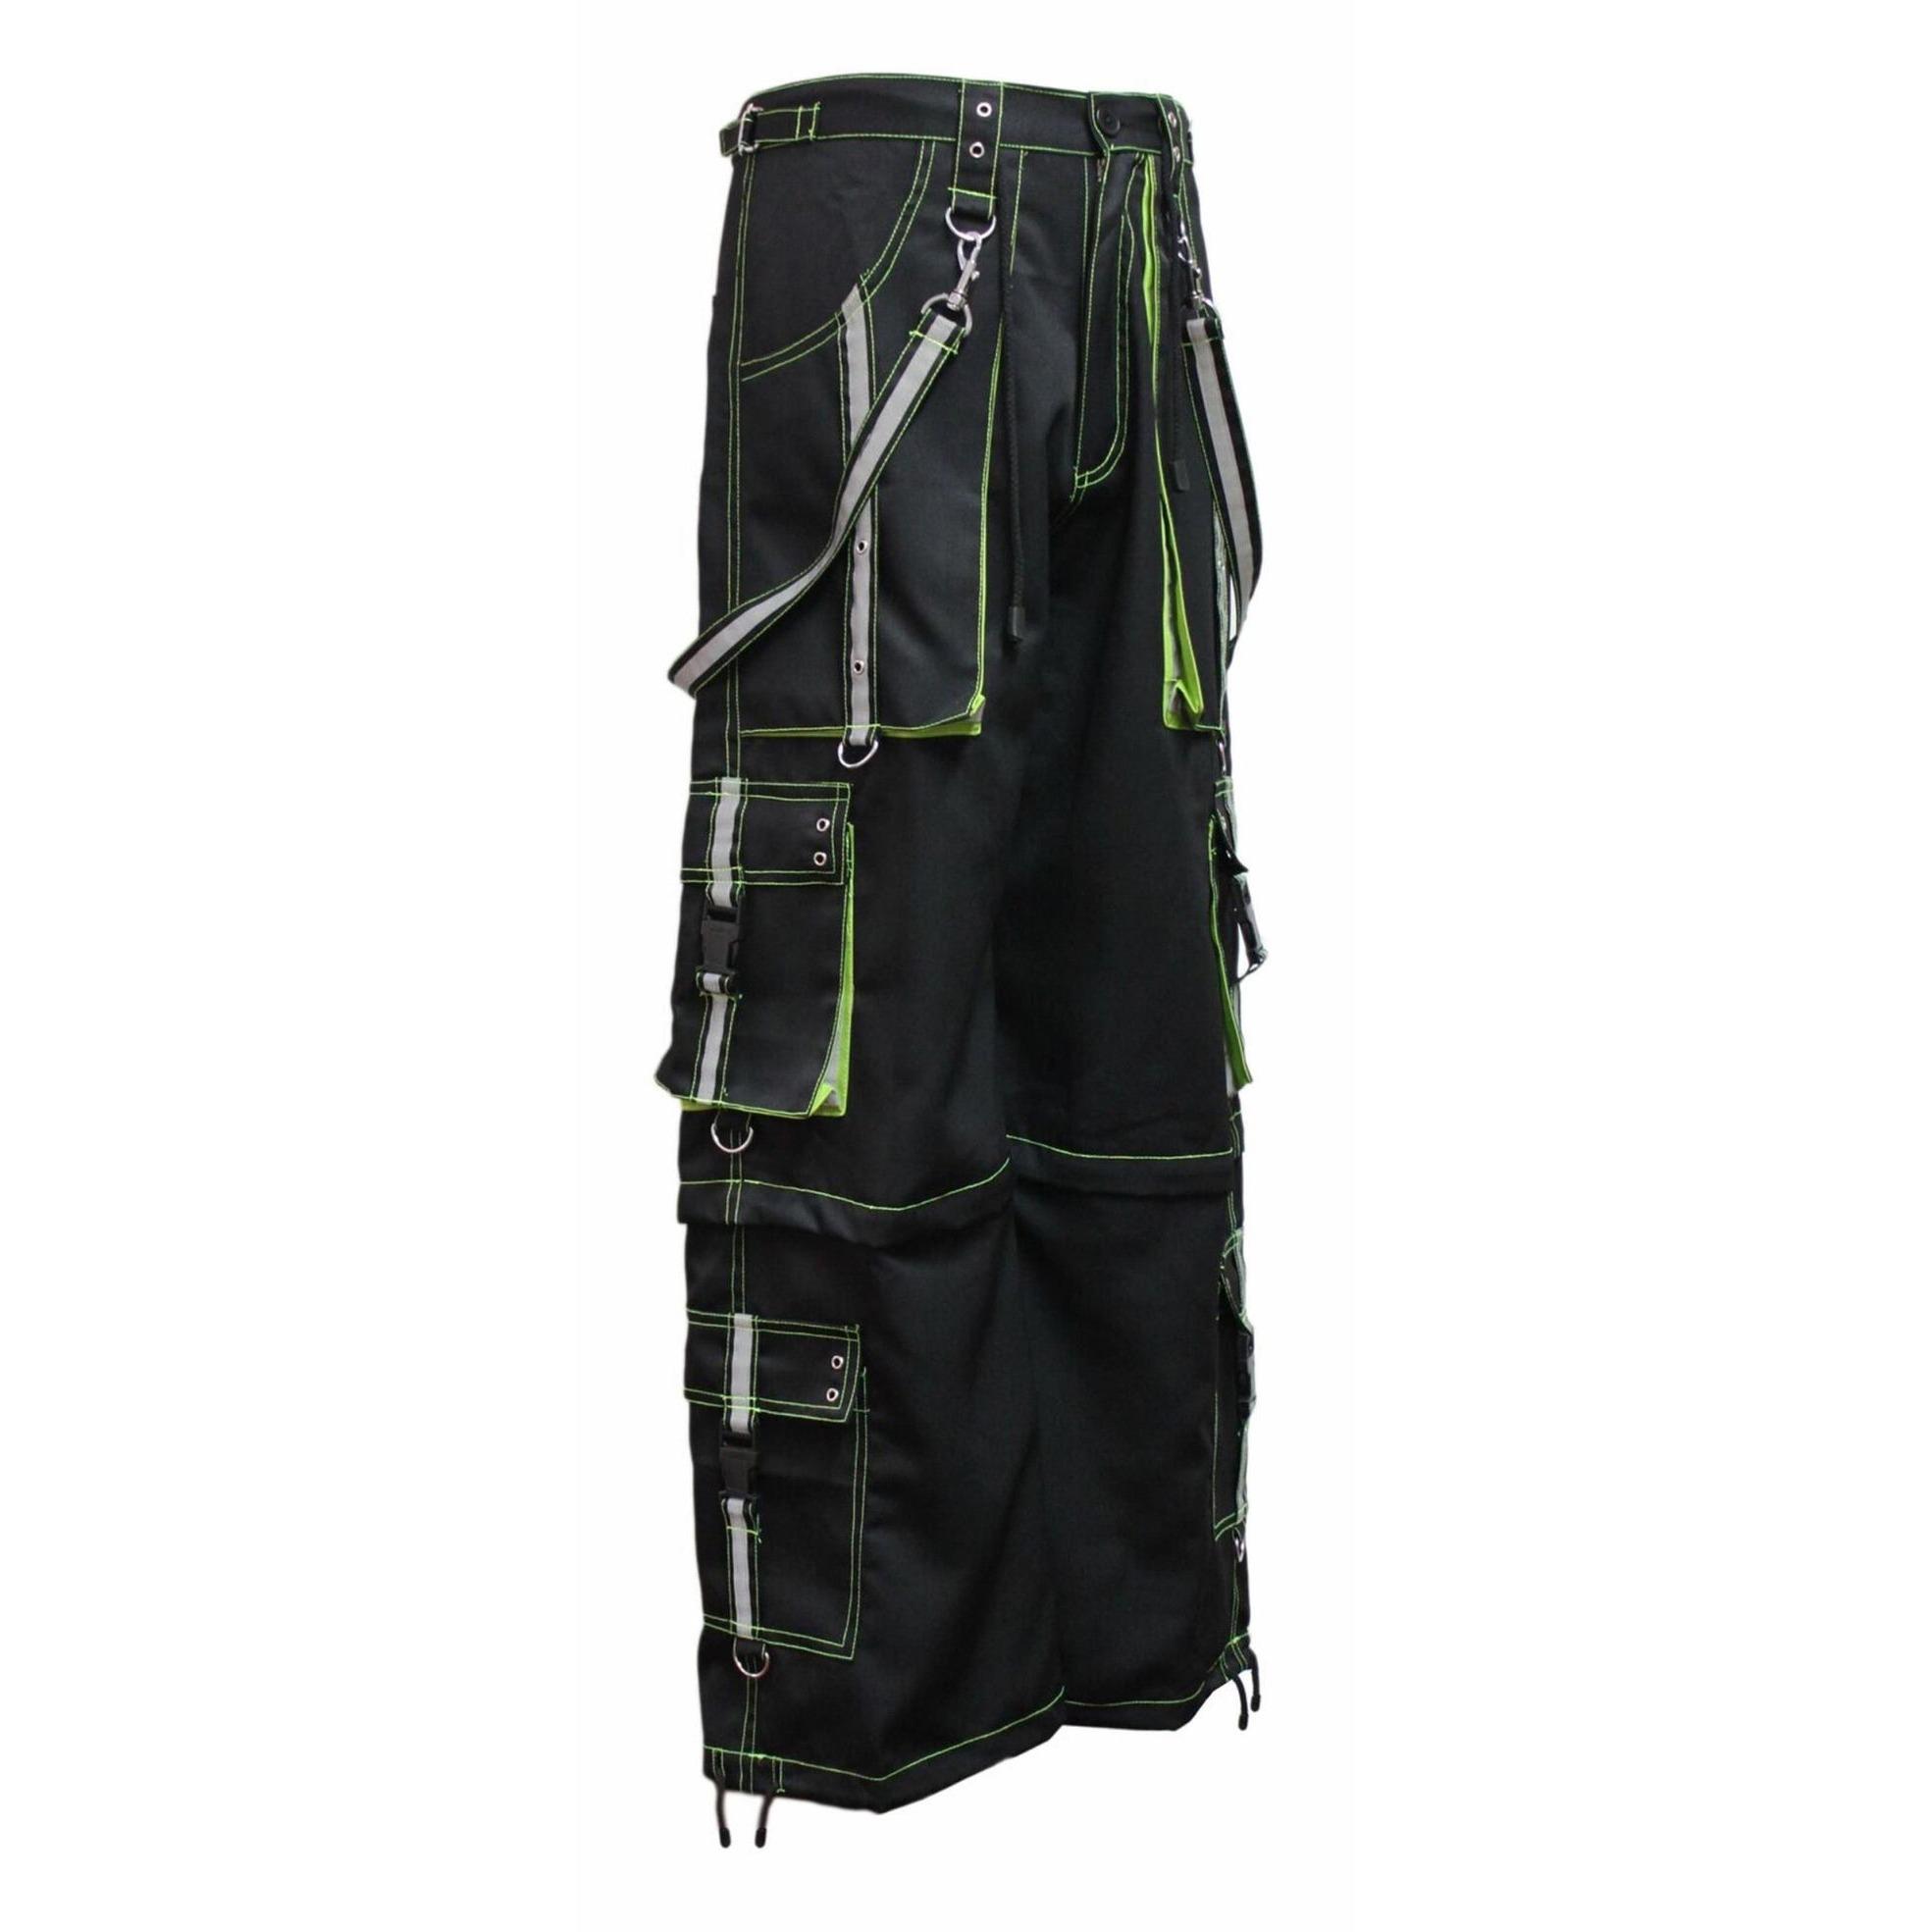 men,s Gothic handmade Bondage Reflective Men Pant 6 pockets Punk Rock Trouser Pant Shorts